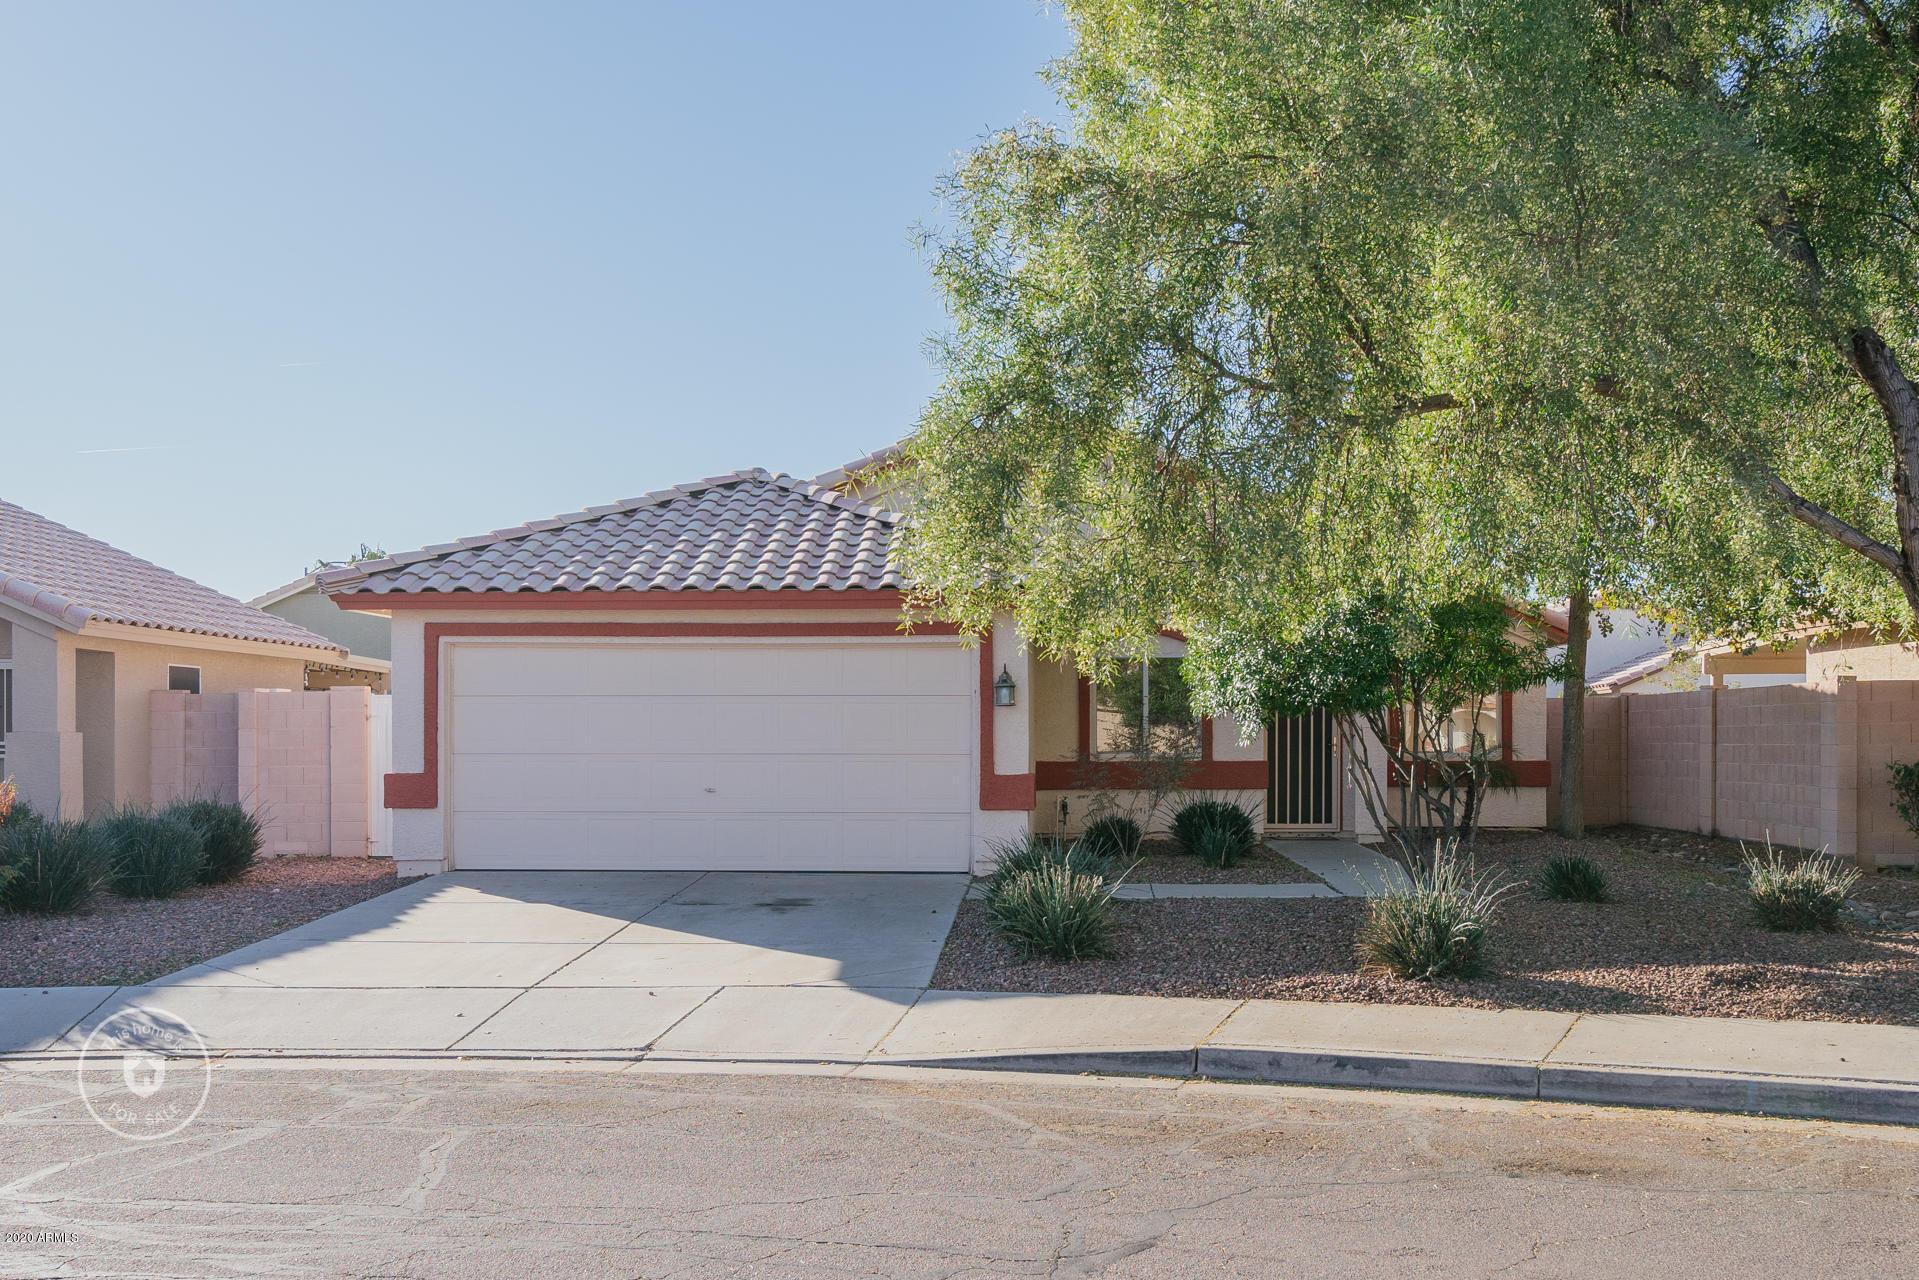 Photo of 16173 W HADLEY Street, Goodyear, AZ 85338